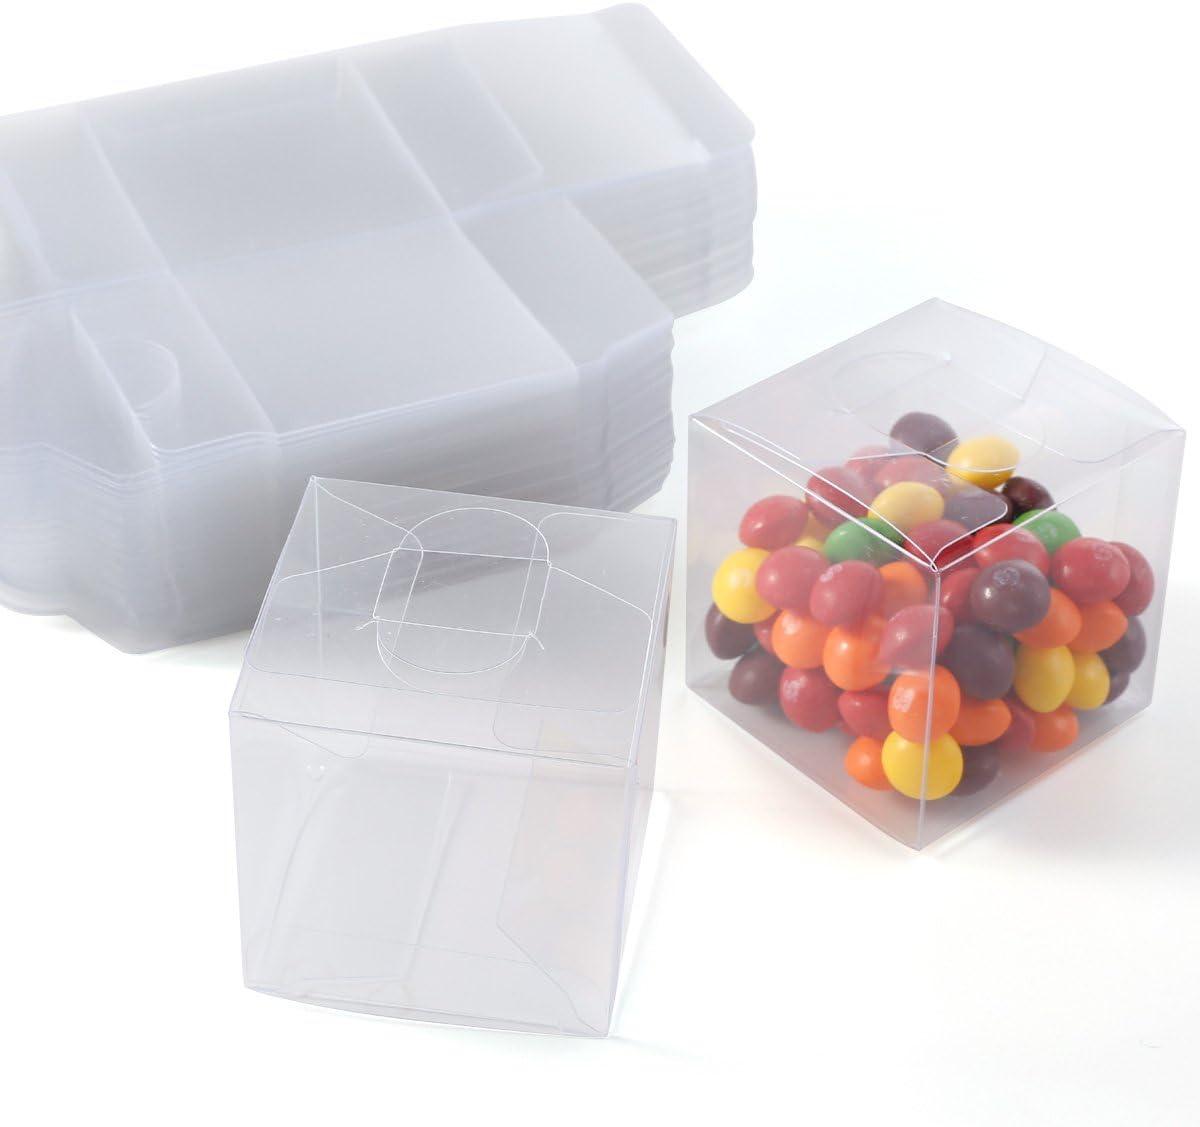 Set de 50/100 Cajas para dulces bombones Cajita cuadrada transparente Plástico para boda regalo Clear Cube Gift Boxes PVC (100)